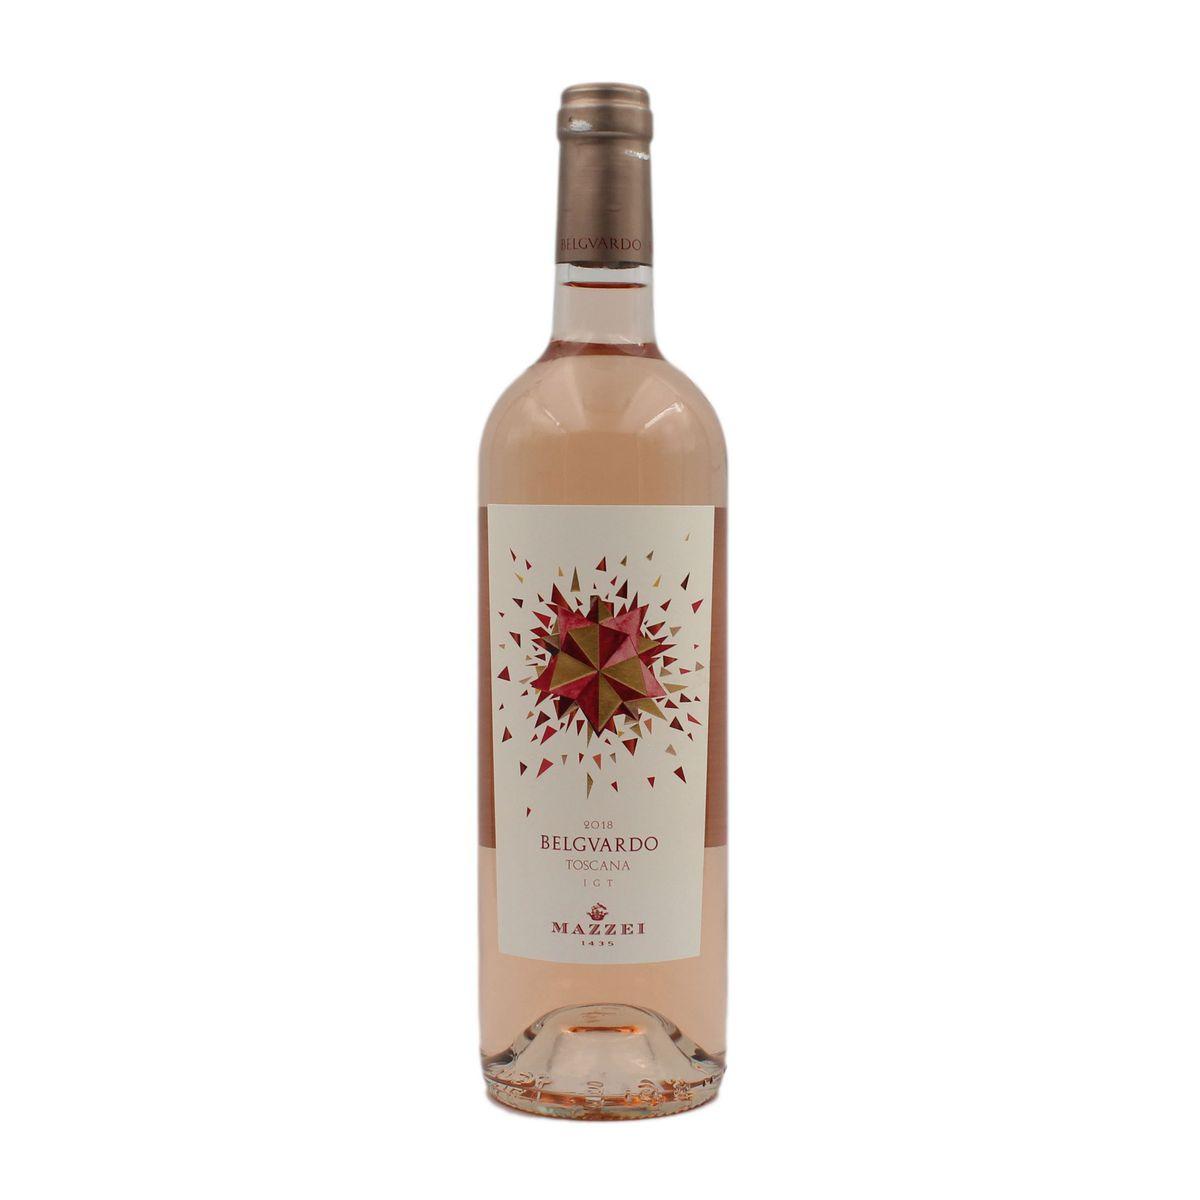 Belguardo Rosé 2018 Marchesi Mazzei